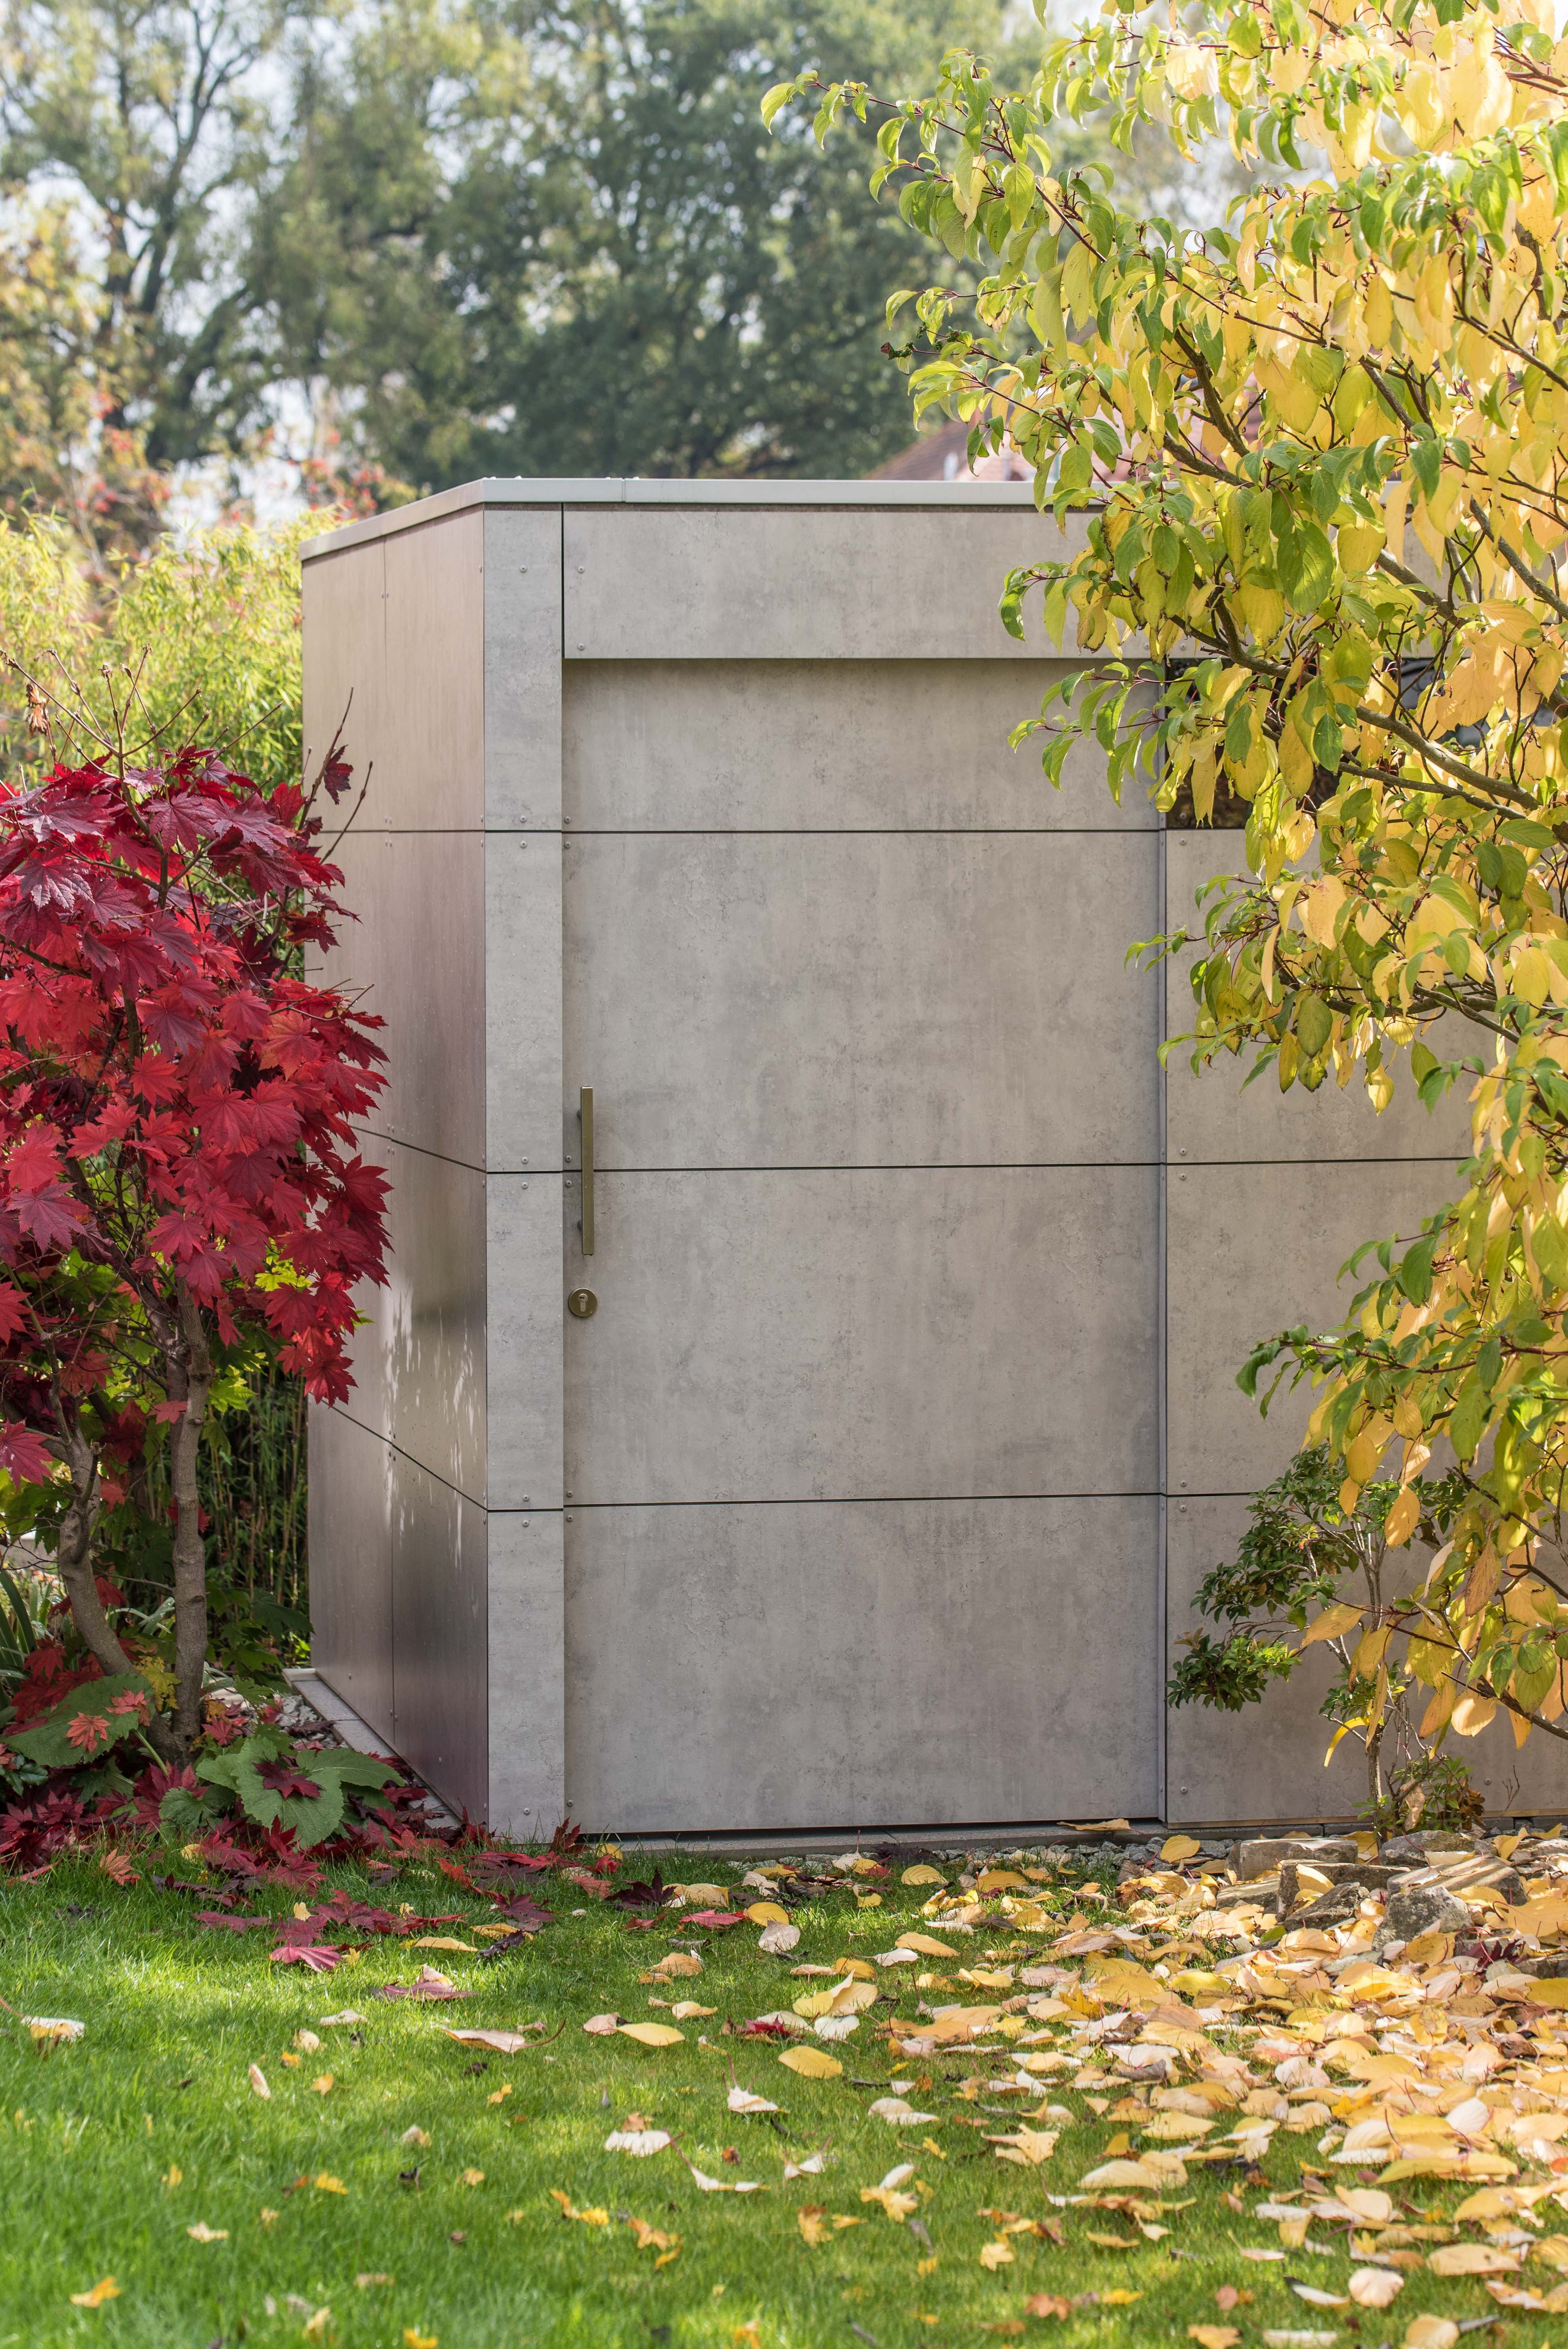 Gartenhaus mit Flachdach - verdeckte Wasserführung, HPL-Fassade ...